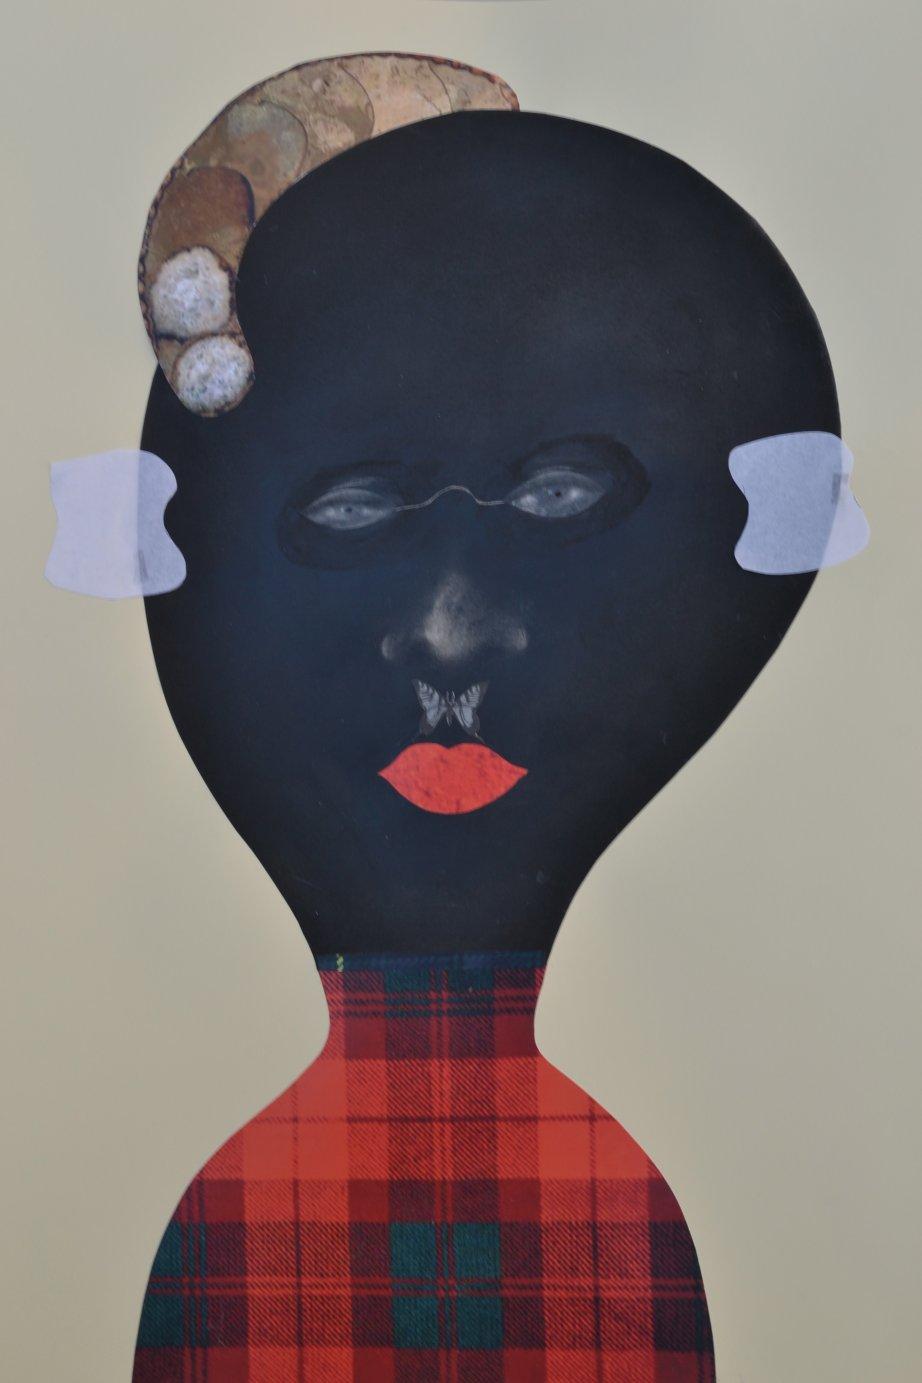 El Accalon (2017) - Guillermo Fernández-Díez Bannatyne